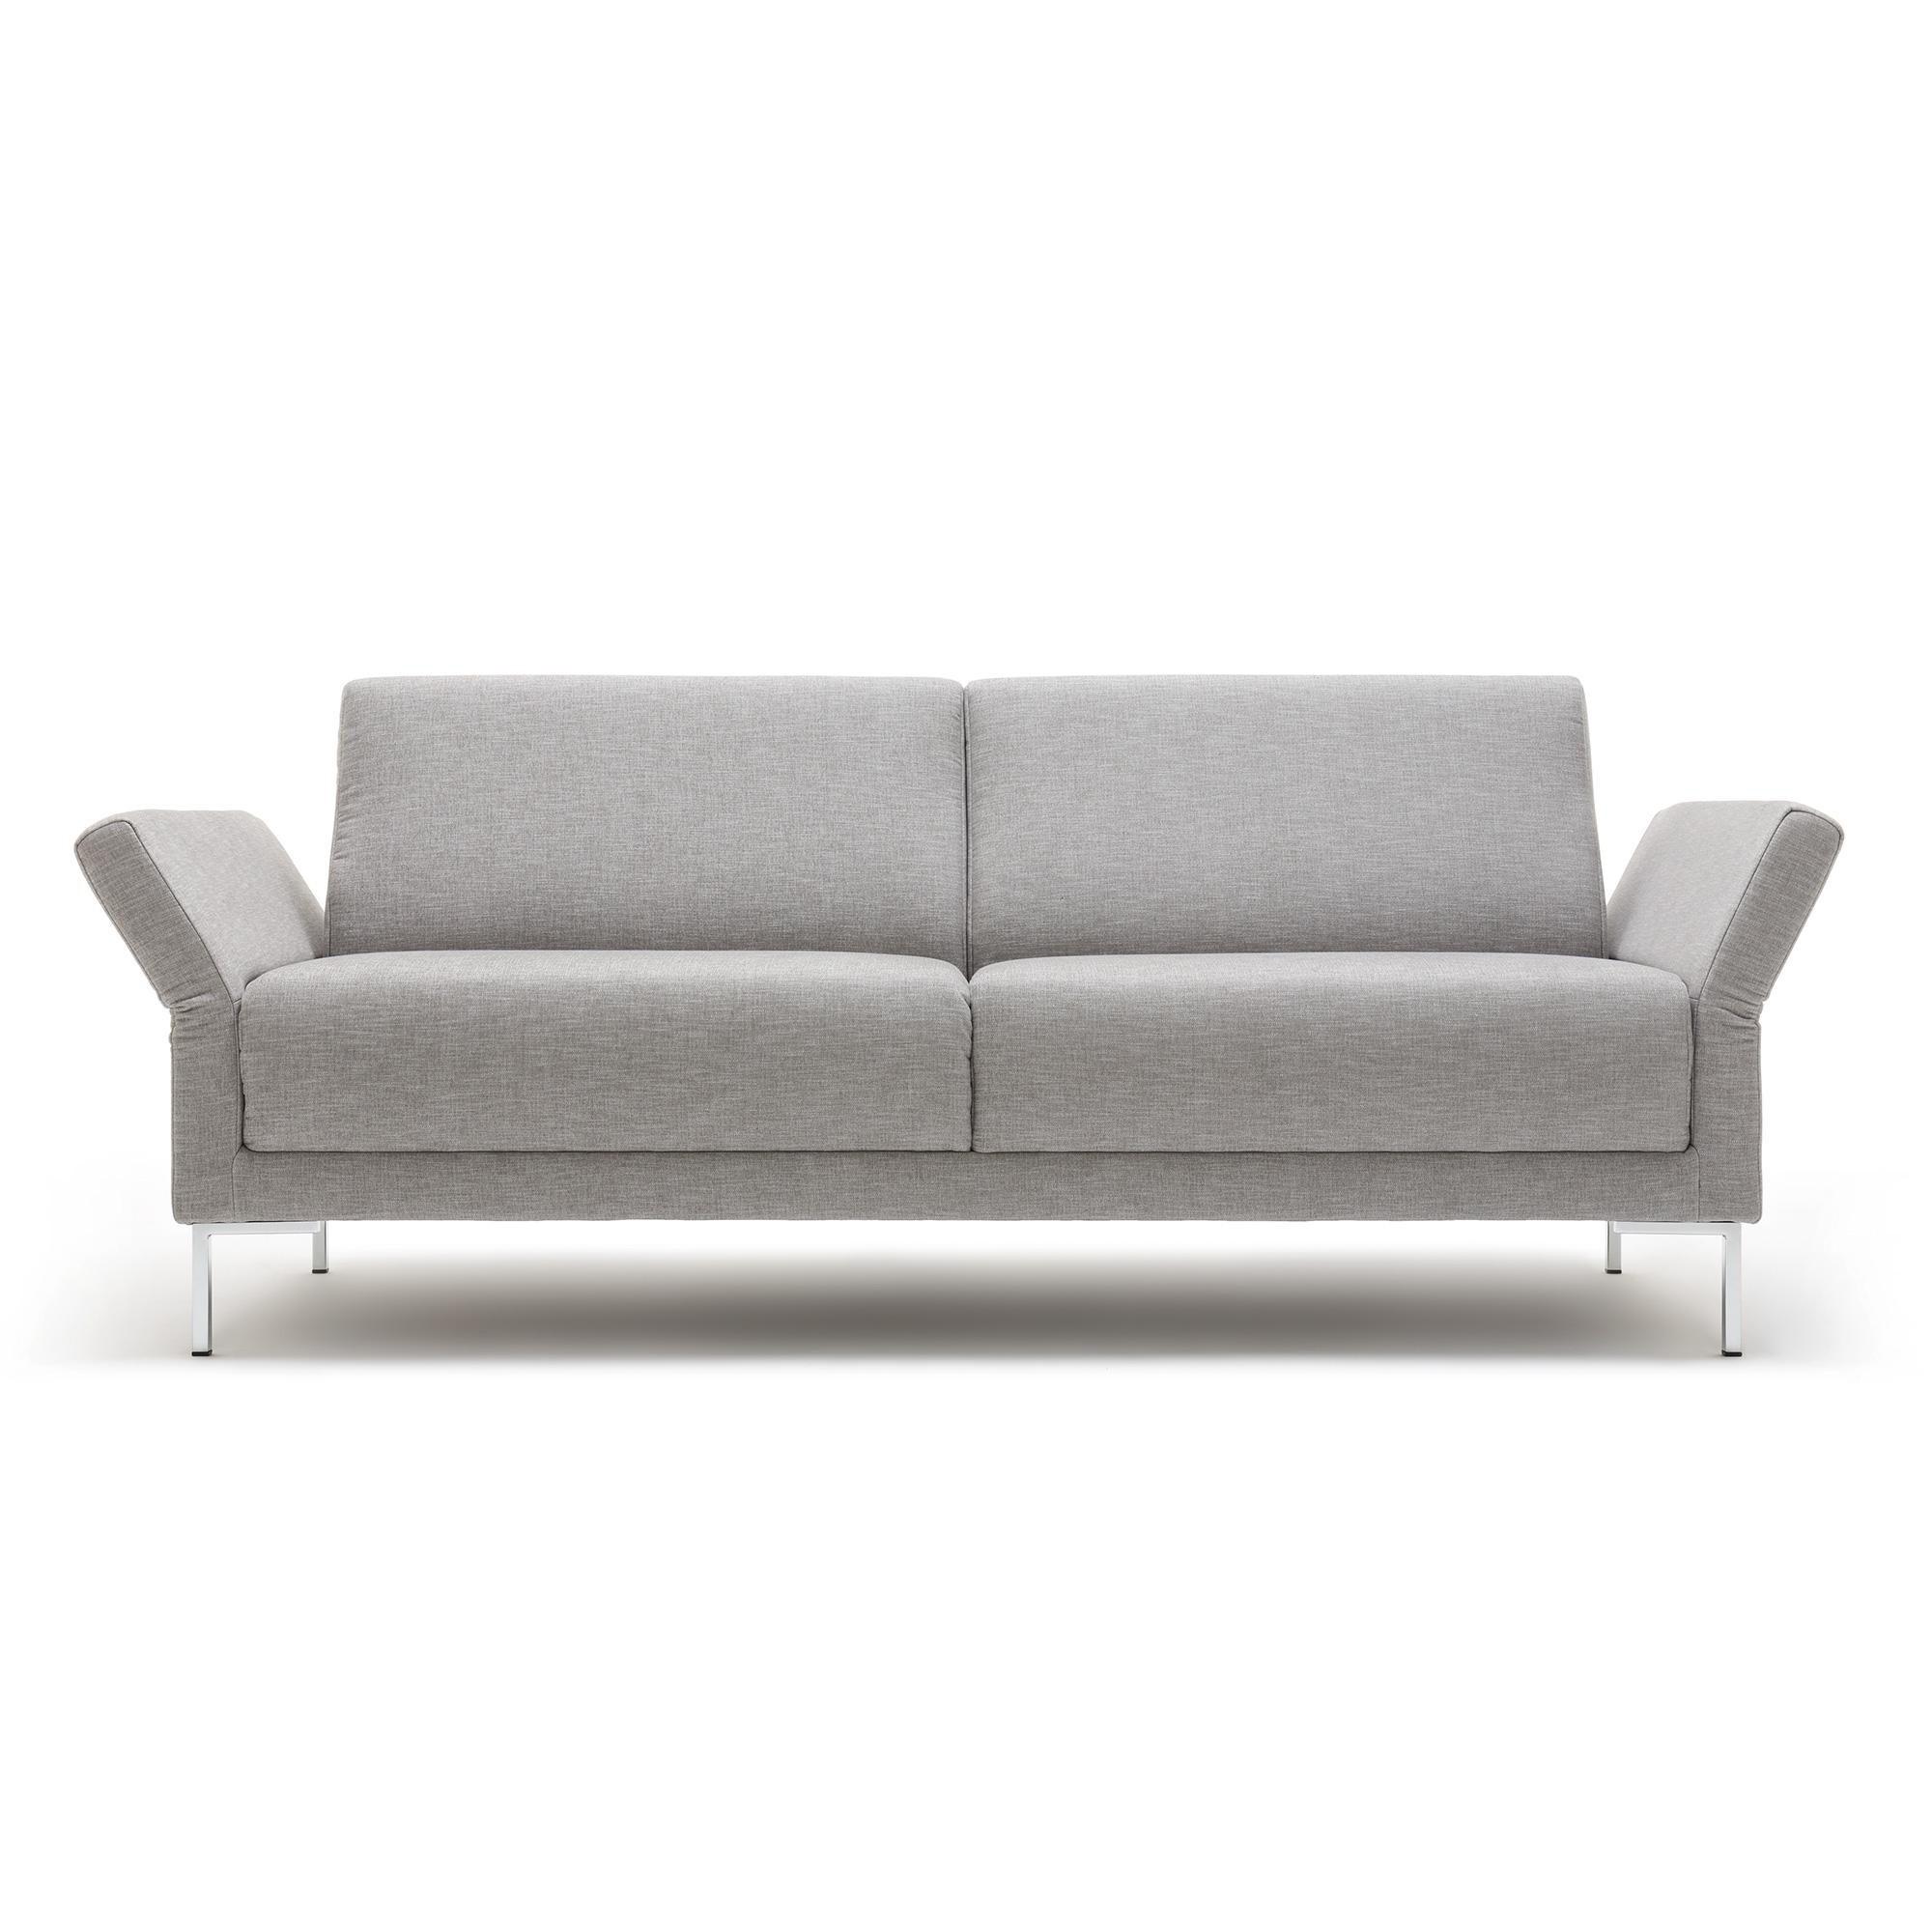 Freistil 141 Sofa 2 Seater 228x81x88cm